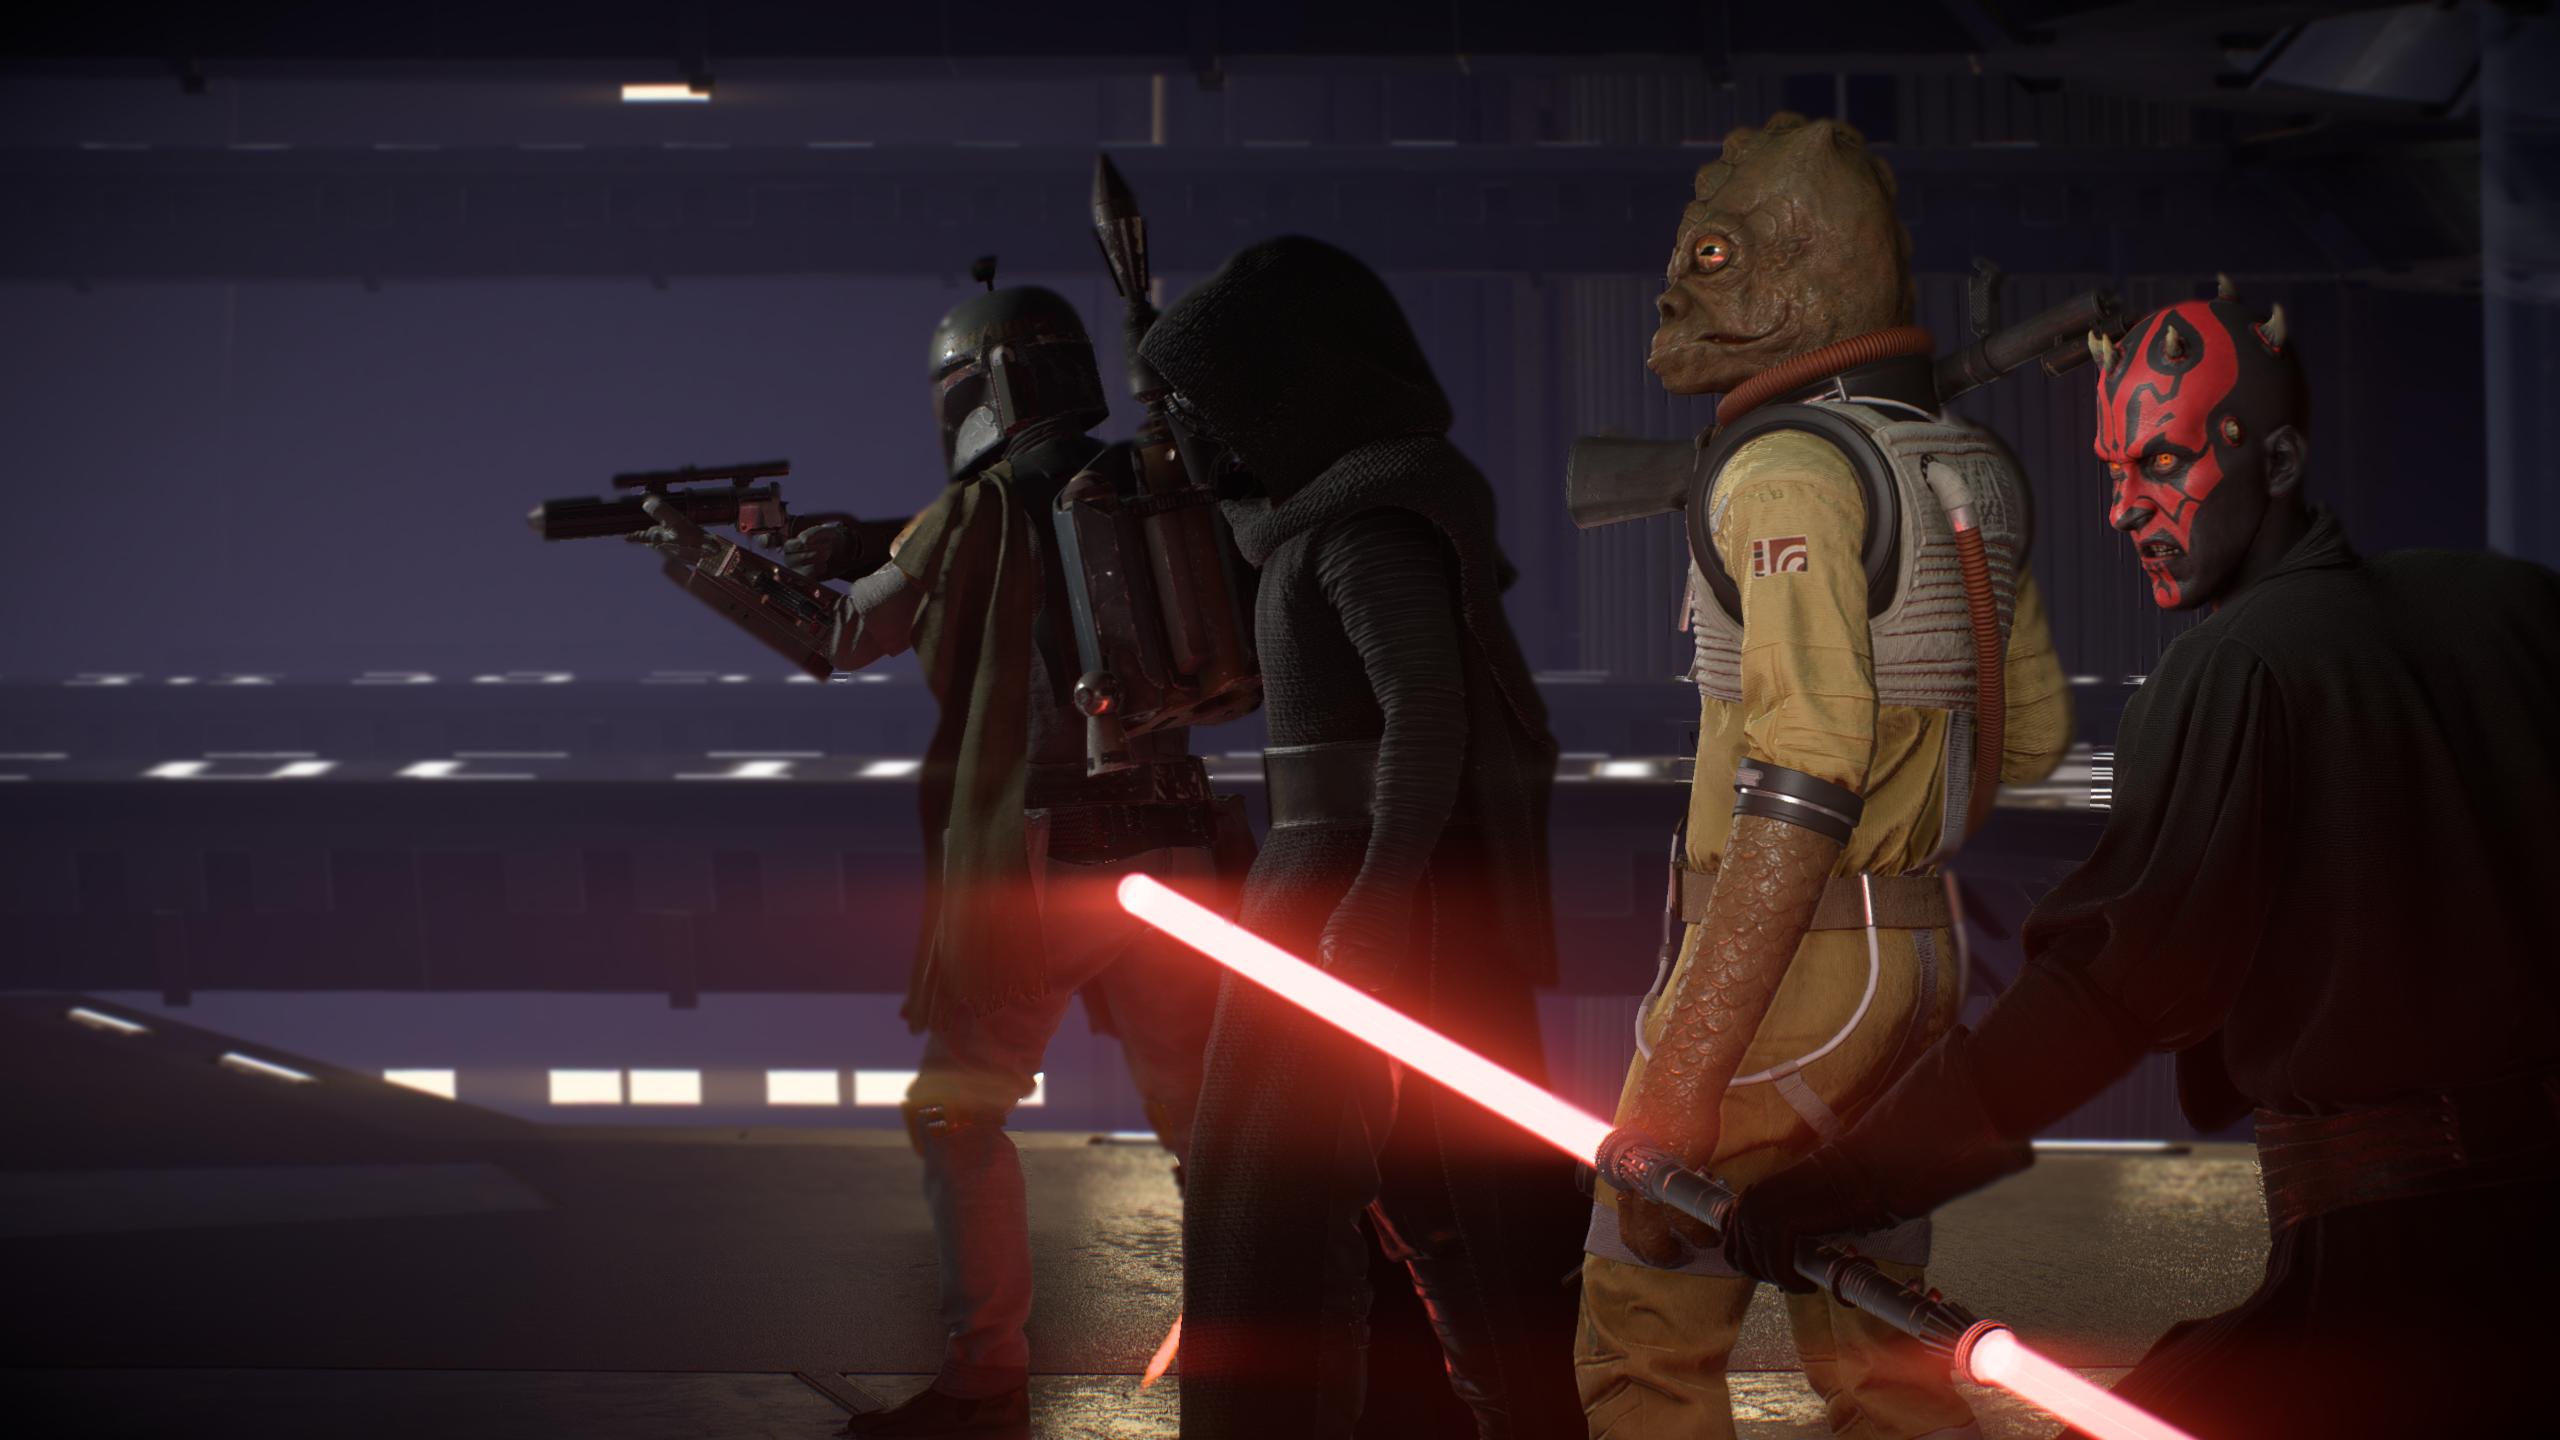 Wallpaper Star Wars Battlefront Kylo Ren Darth Maul Boba Fett